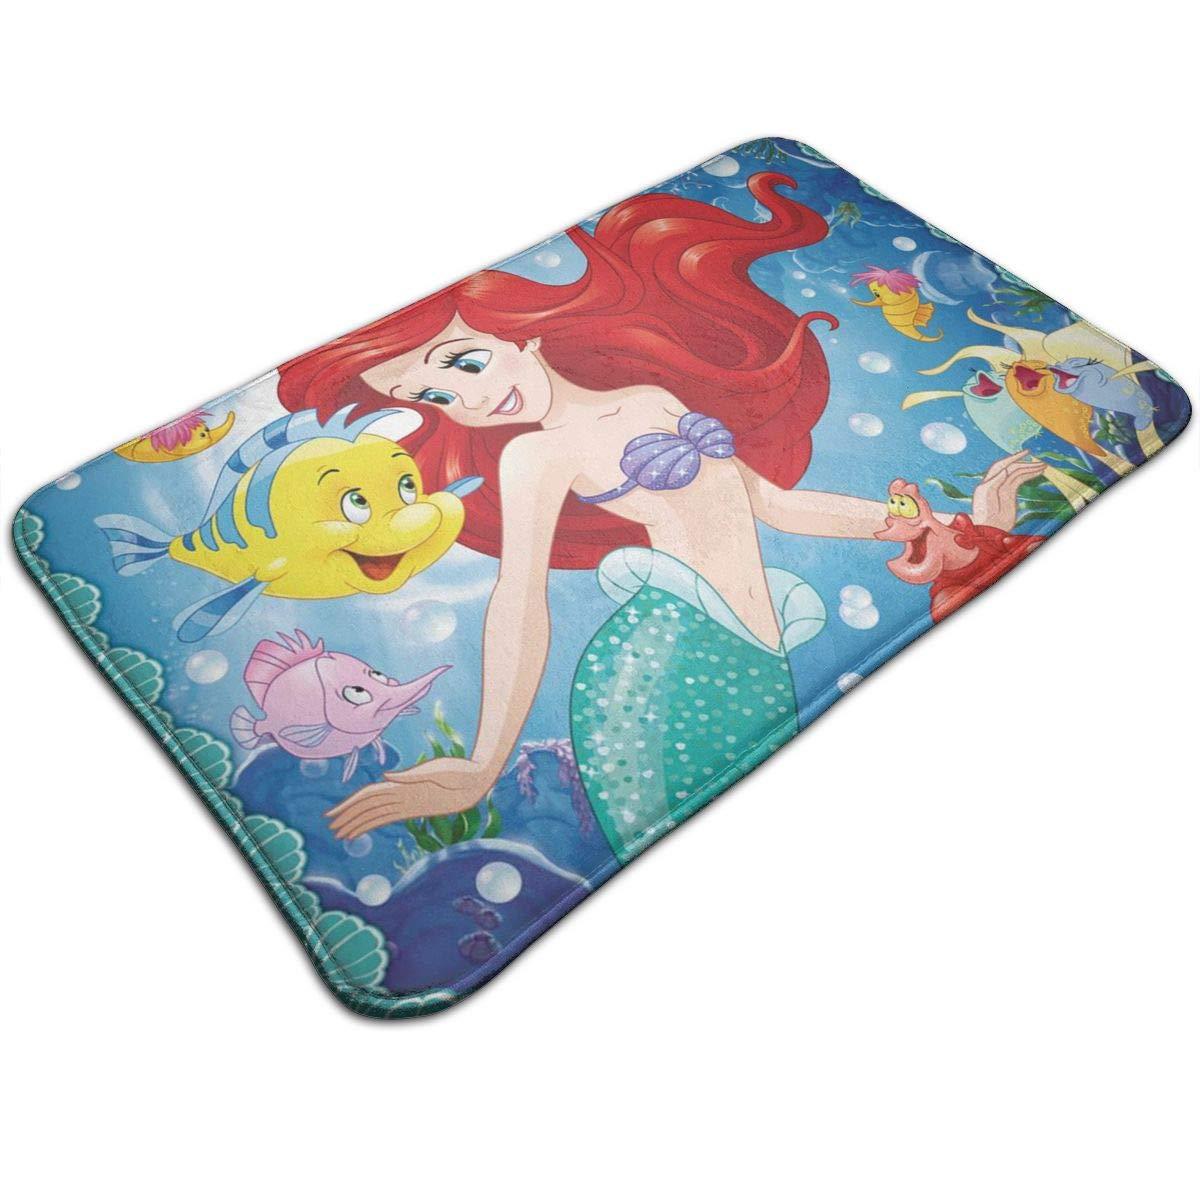 "HARLEY MARTIN Welcome Doormat Ariel Mermaid Disney Princess Rug 19.5"" X 31.5"" Non-Slip Kitchen Home Bathroom Pet Entry Rugs"